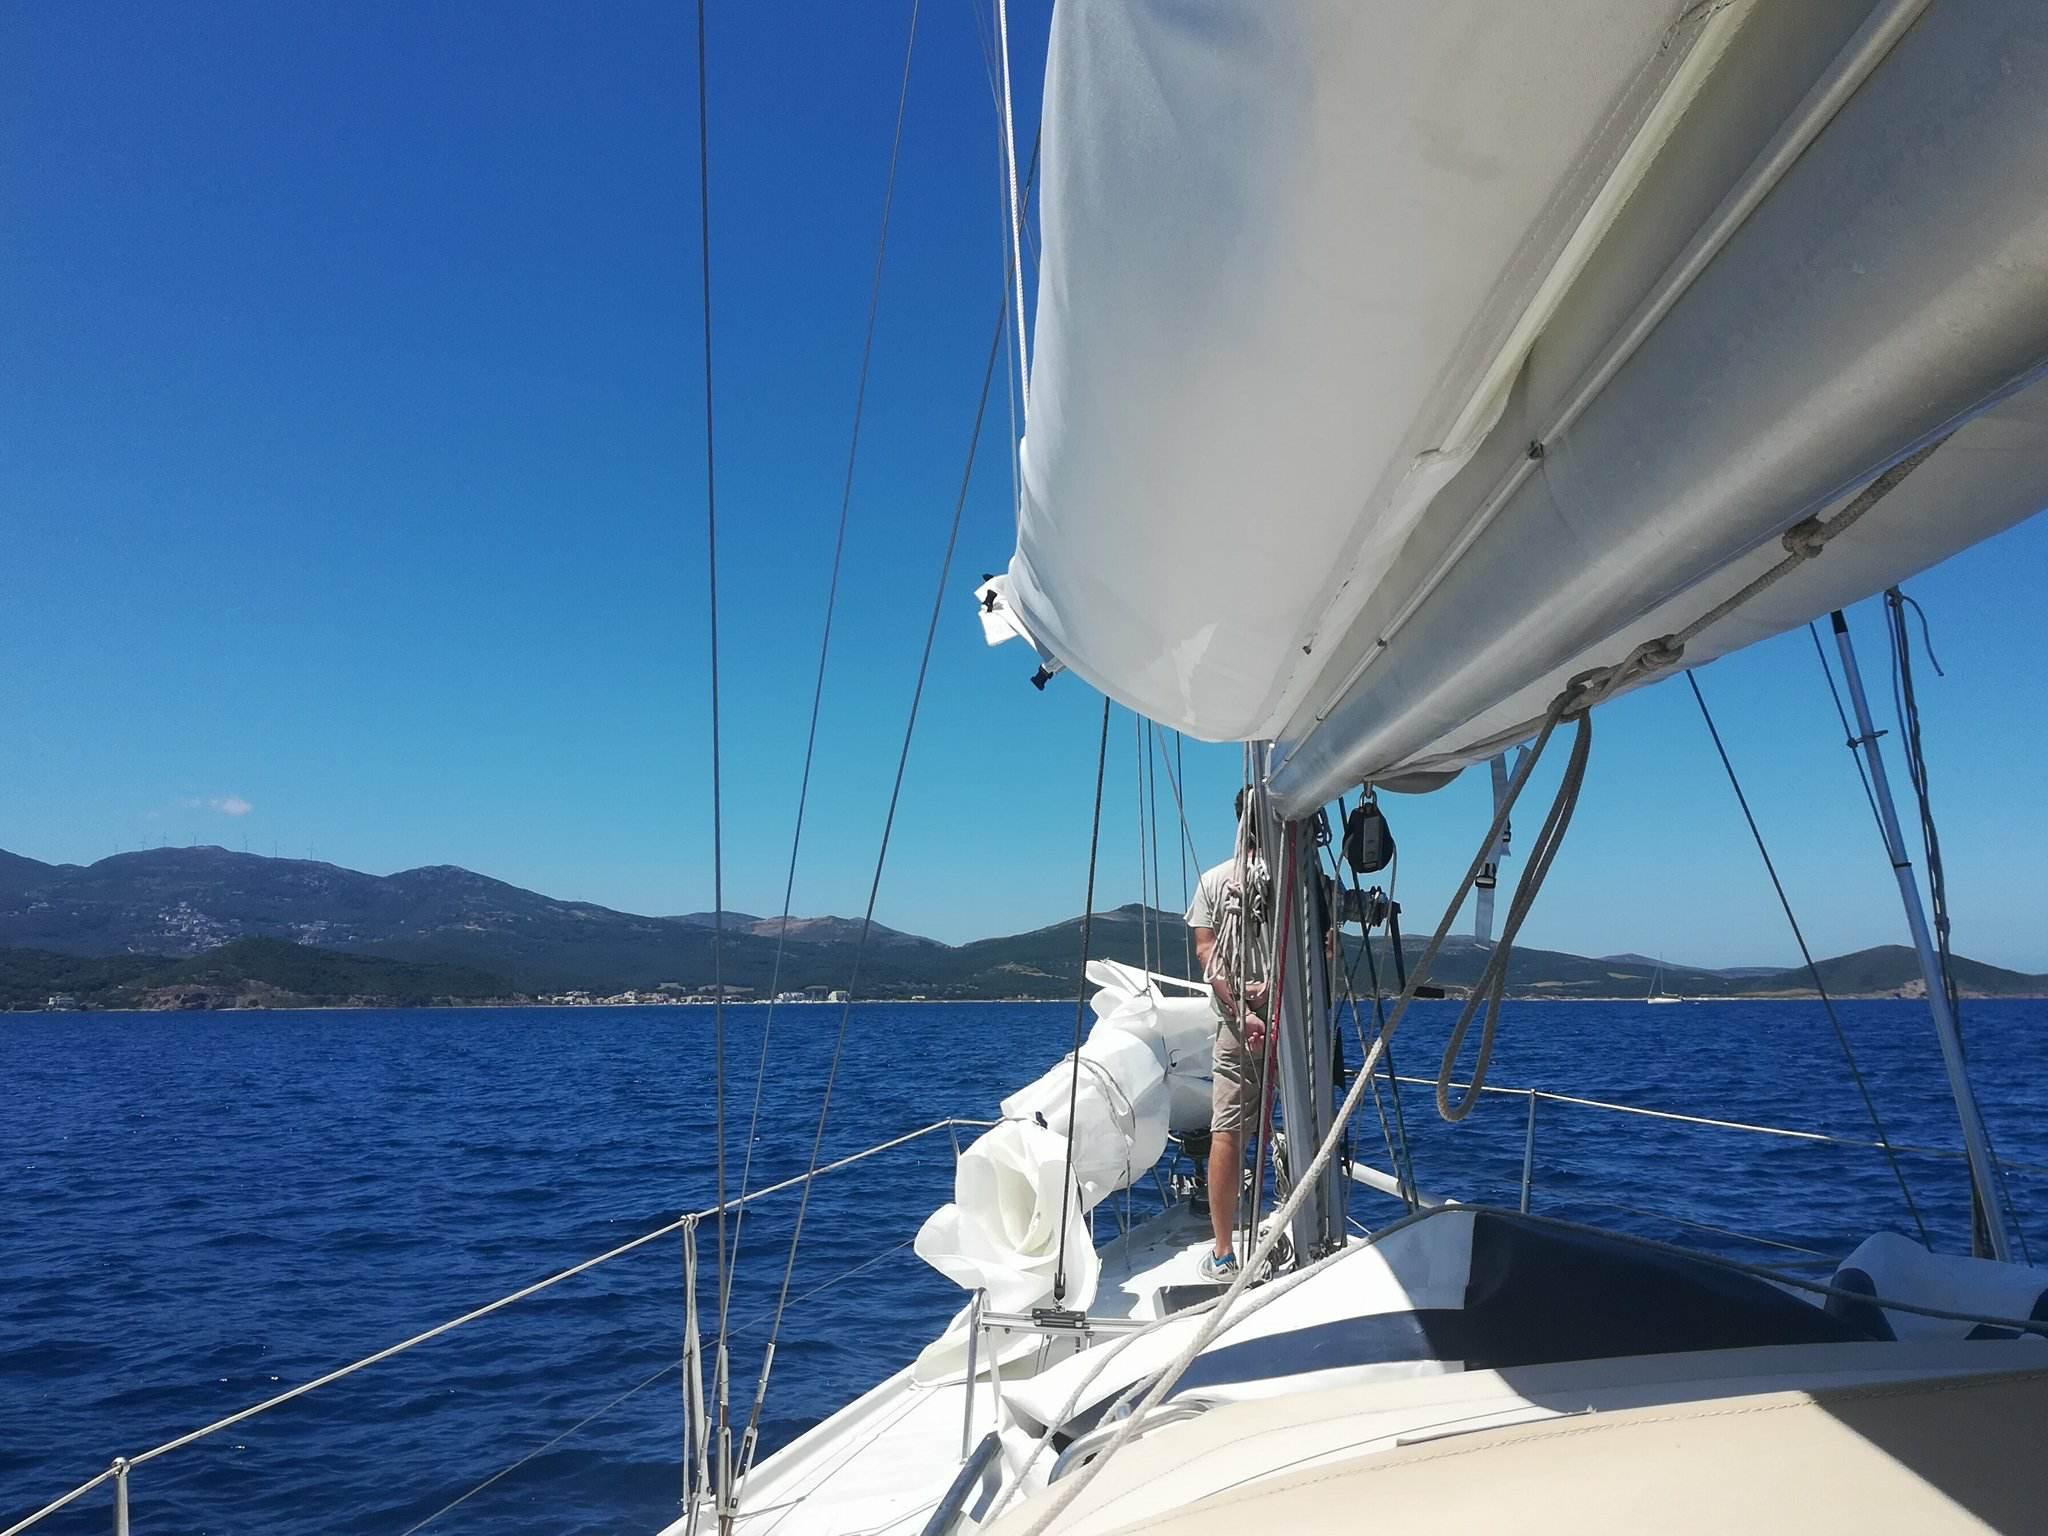 Vacanza in barca a vela all'Isola d'Elba dal 26 Giugno